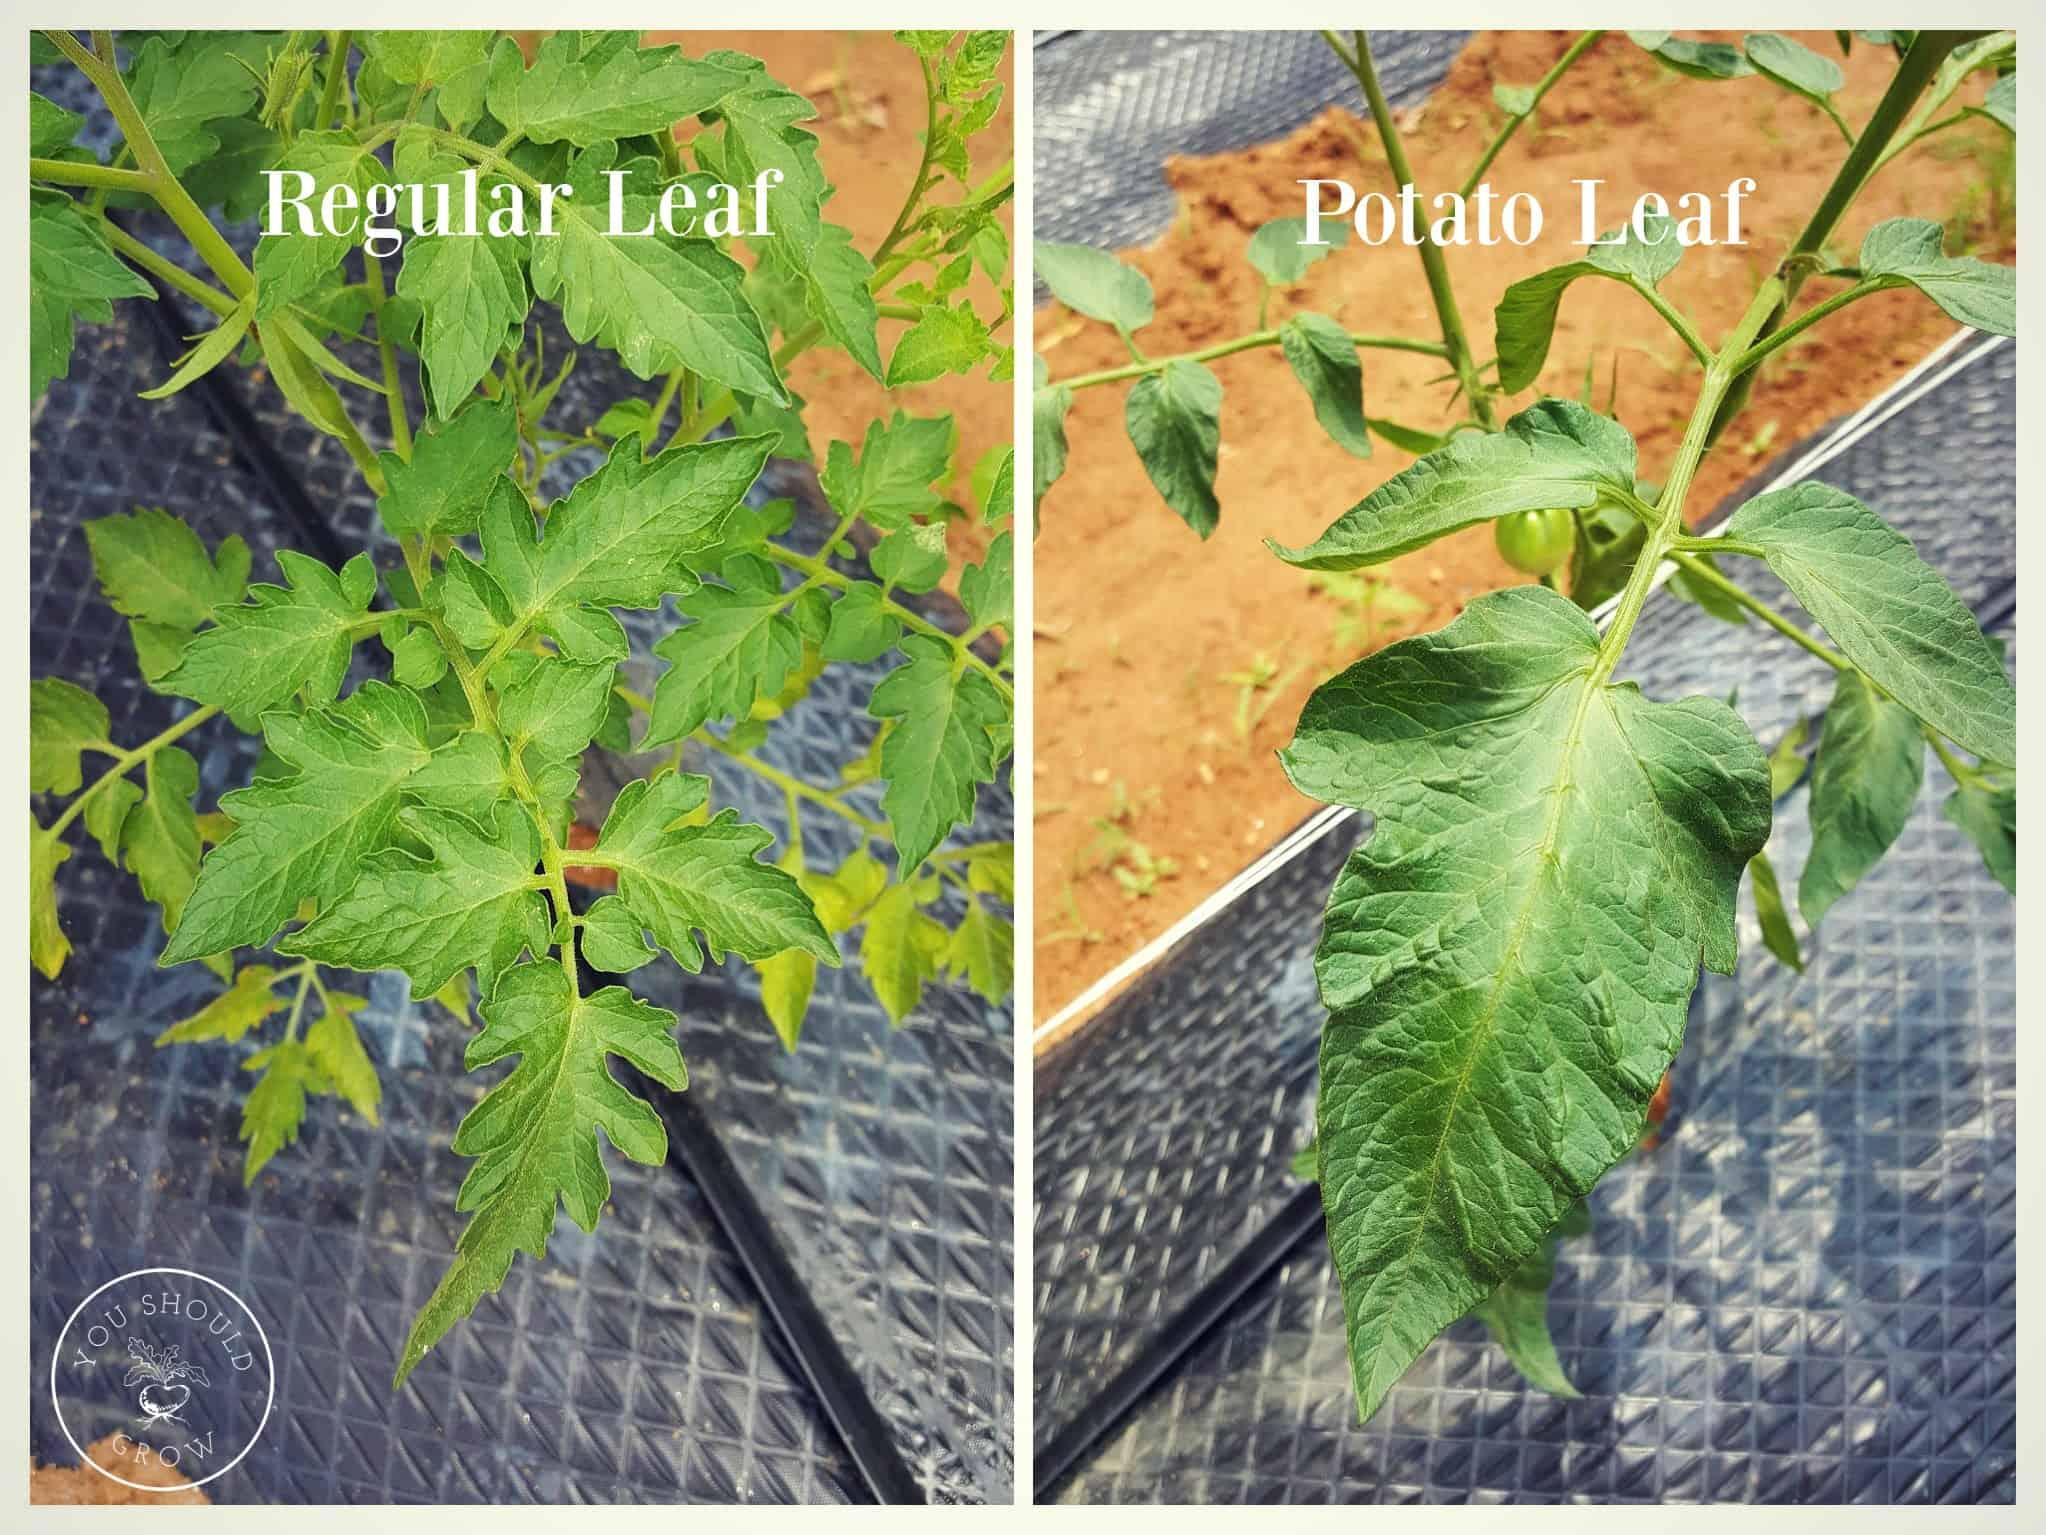 Image comparing regular leaf and potato leaf tomato plants